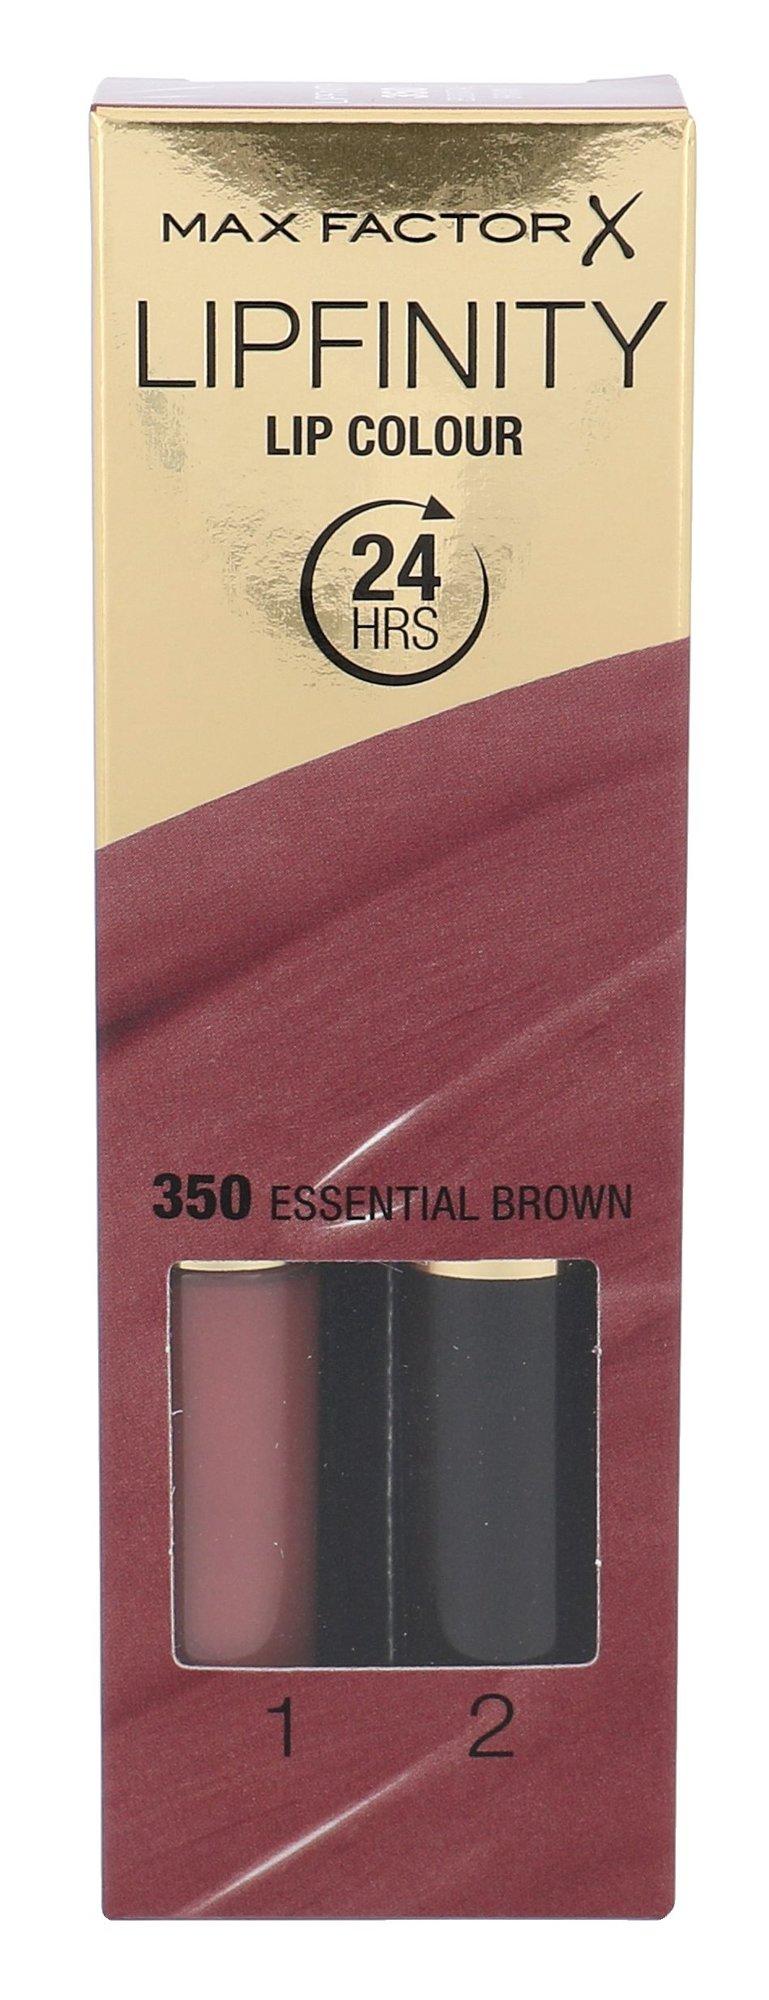 Max Factor Lipfinity Cosmetic 4,2ml 350 Essential Brown